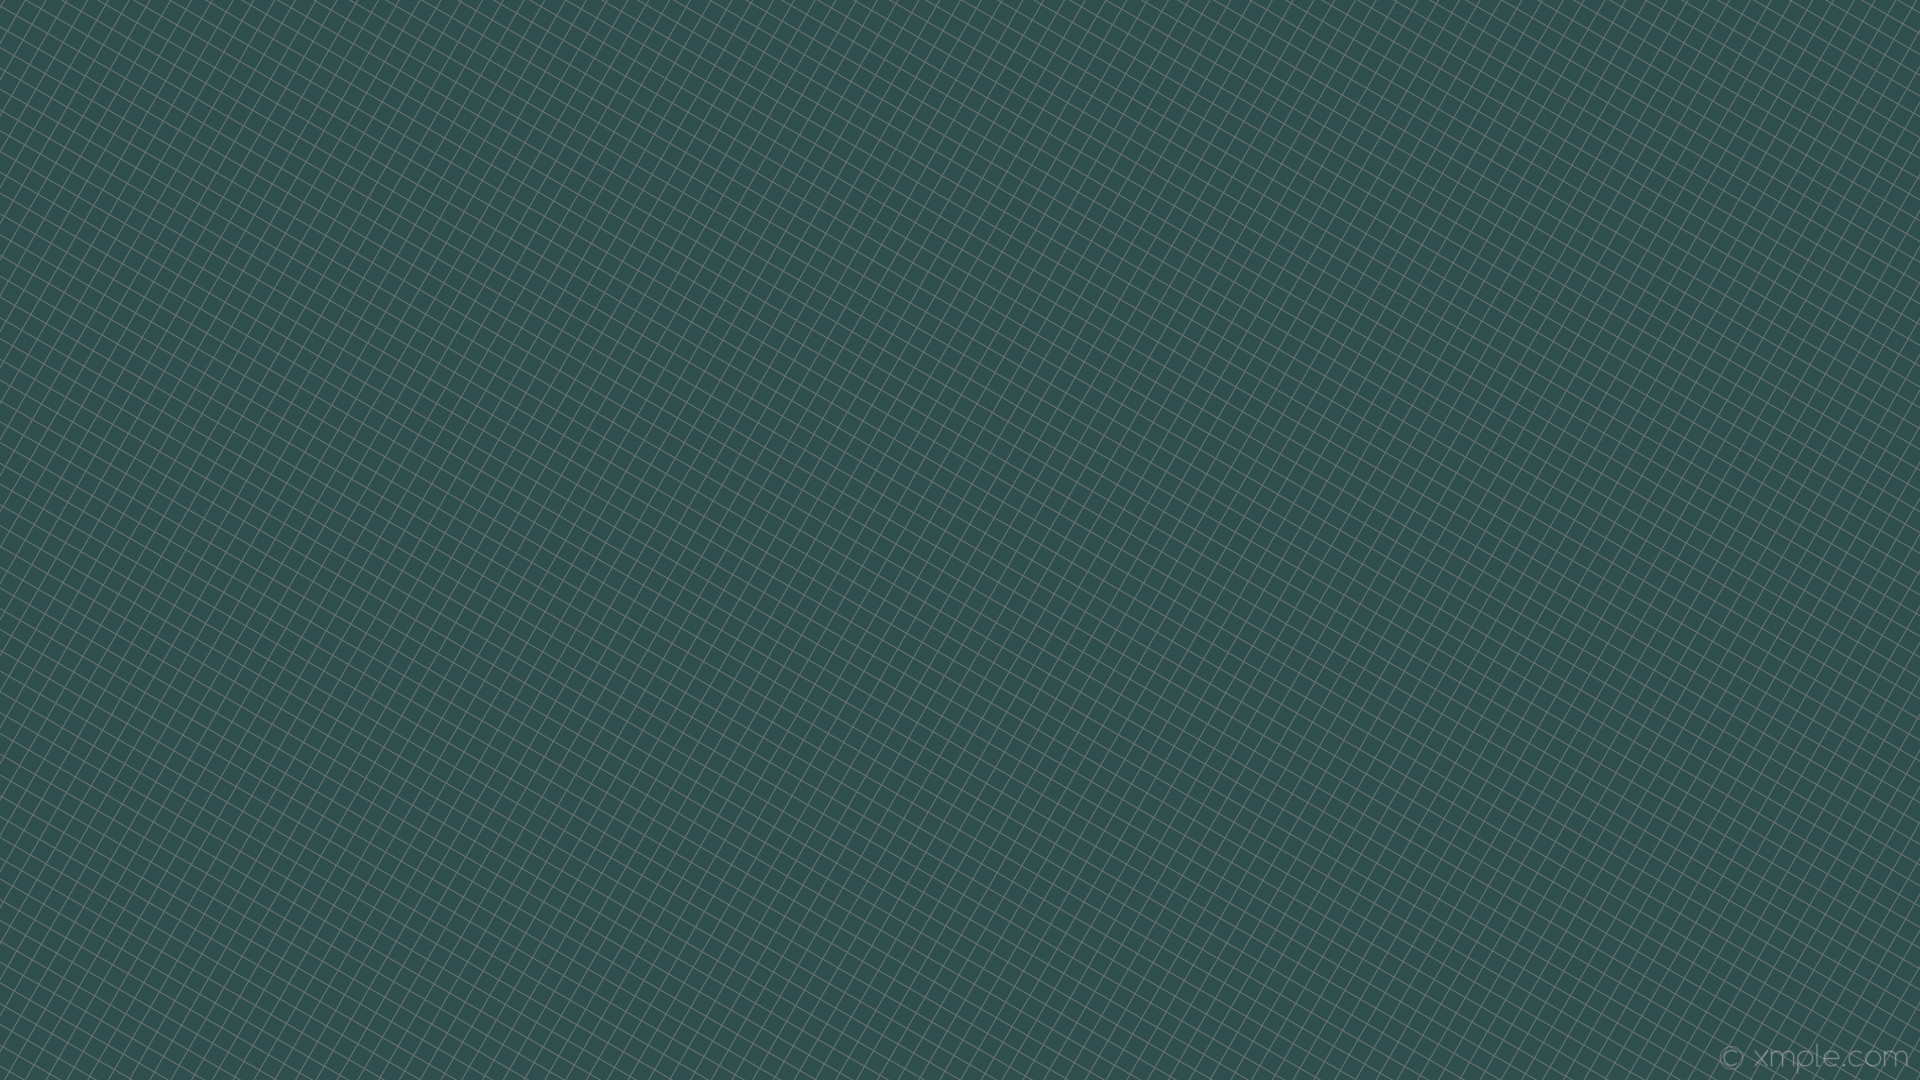 wallpaper grid grey graph paper dark slate gray gray #2f4f4f #808080 60° 1px